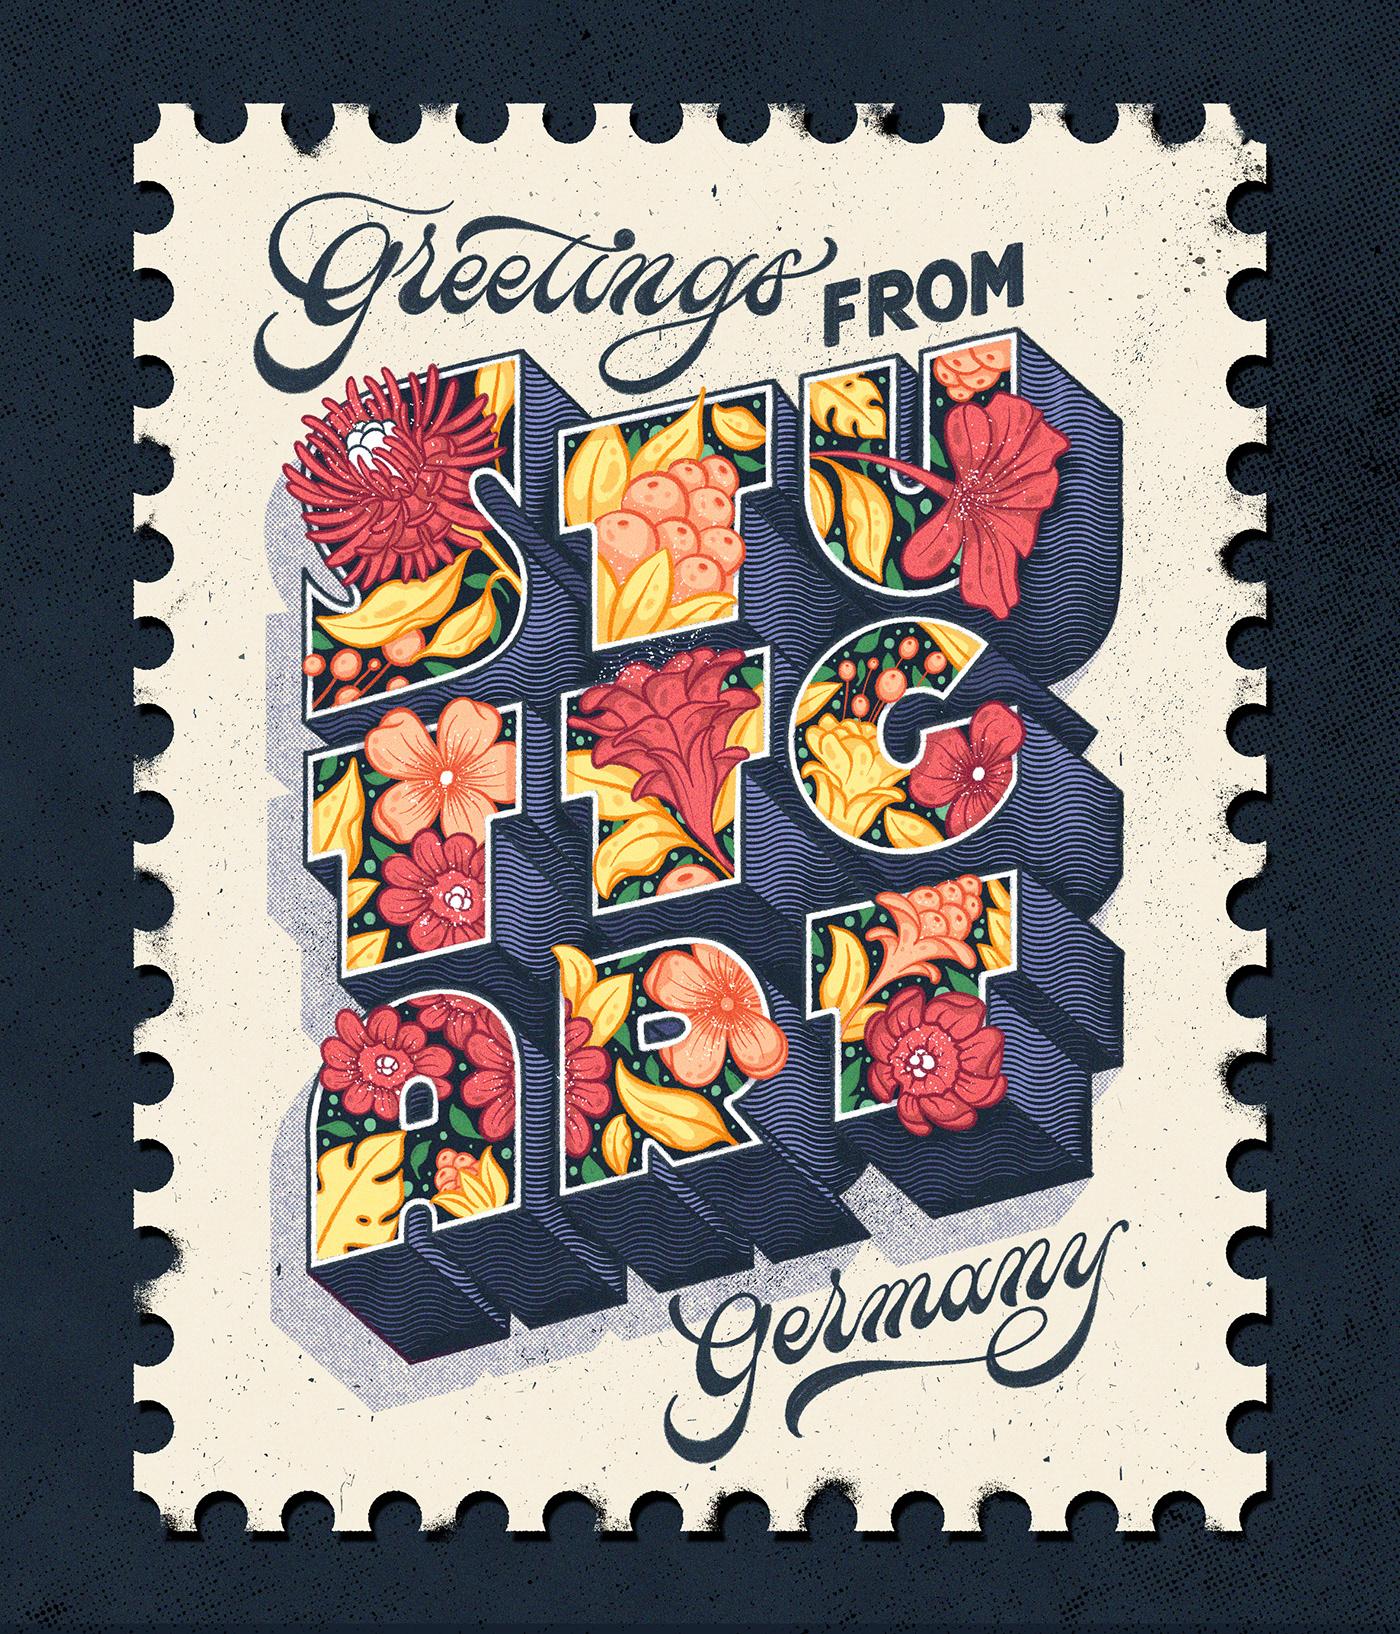 stuttgart stamp lettering flower Floral Lettering germany city letter type typography